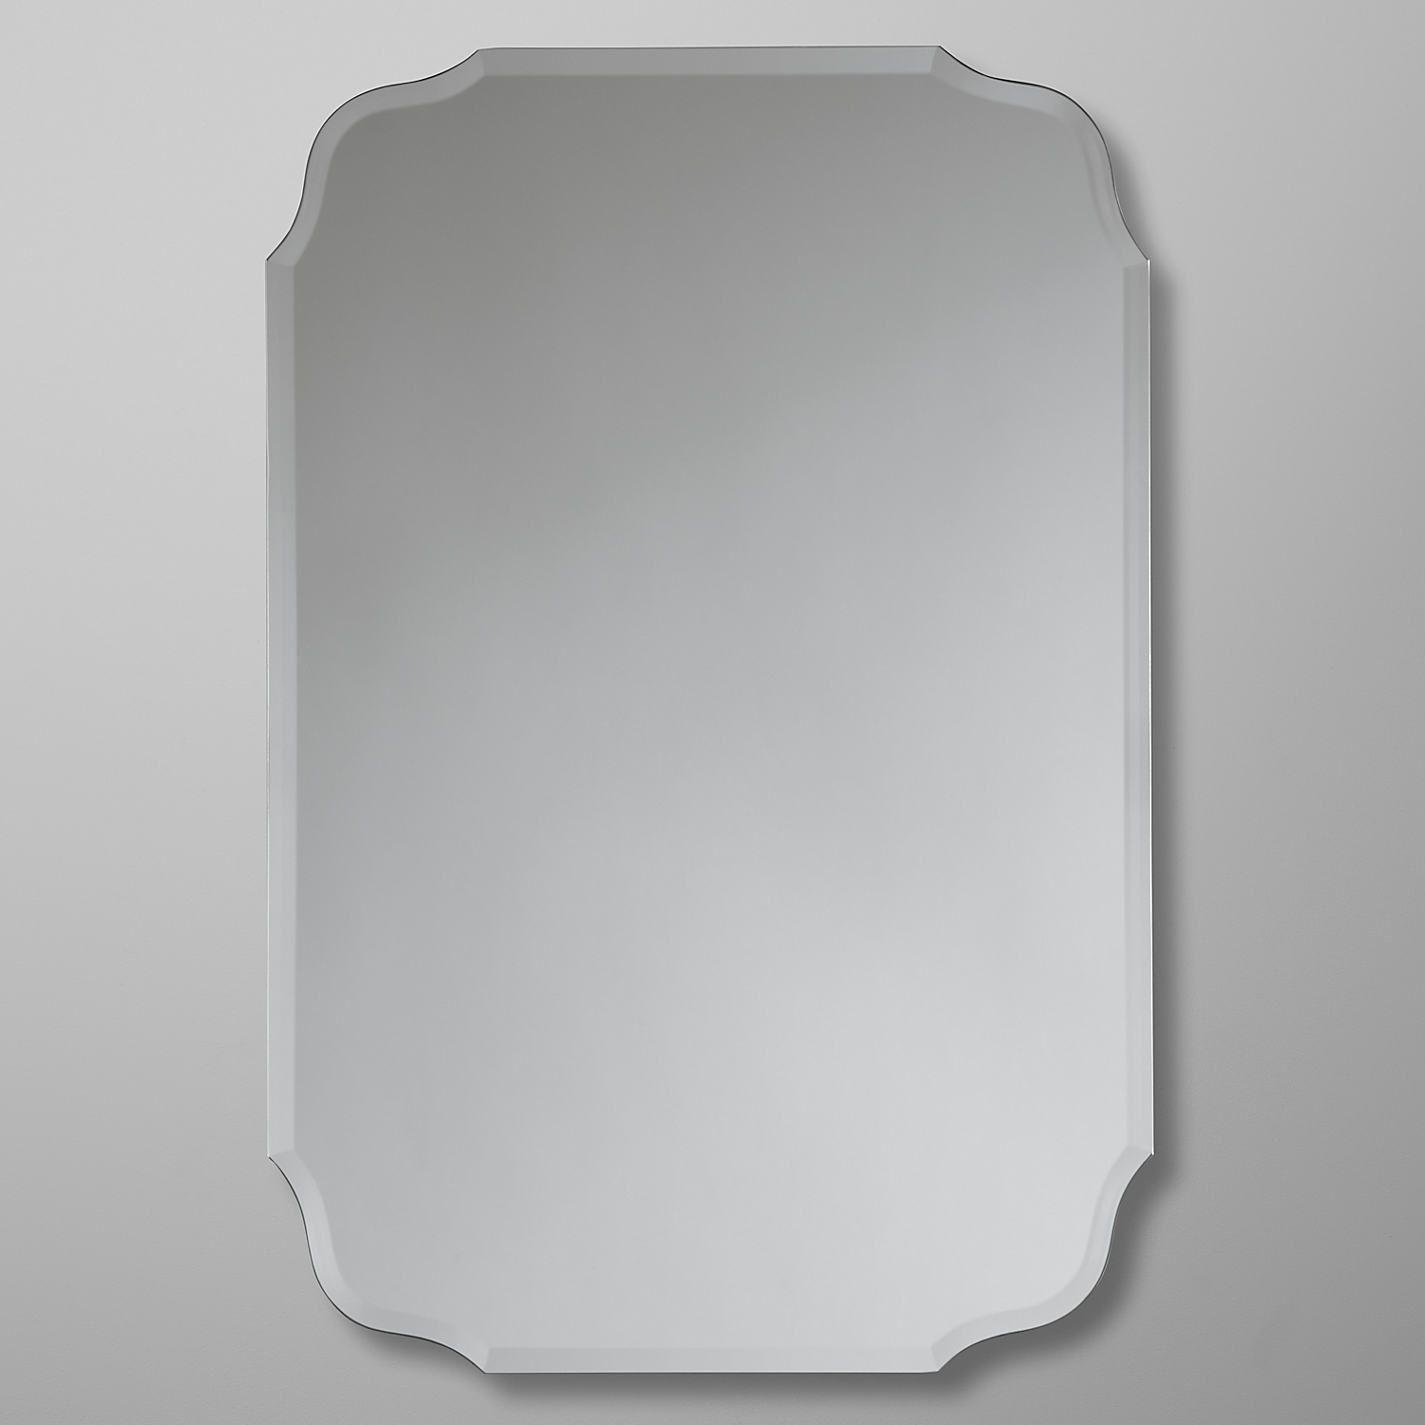 Vintage Bathroom Wall Mirror | Vintage bathrooms, John lewis and ...